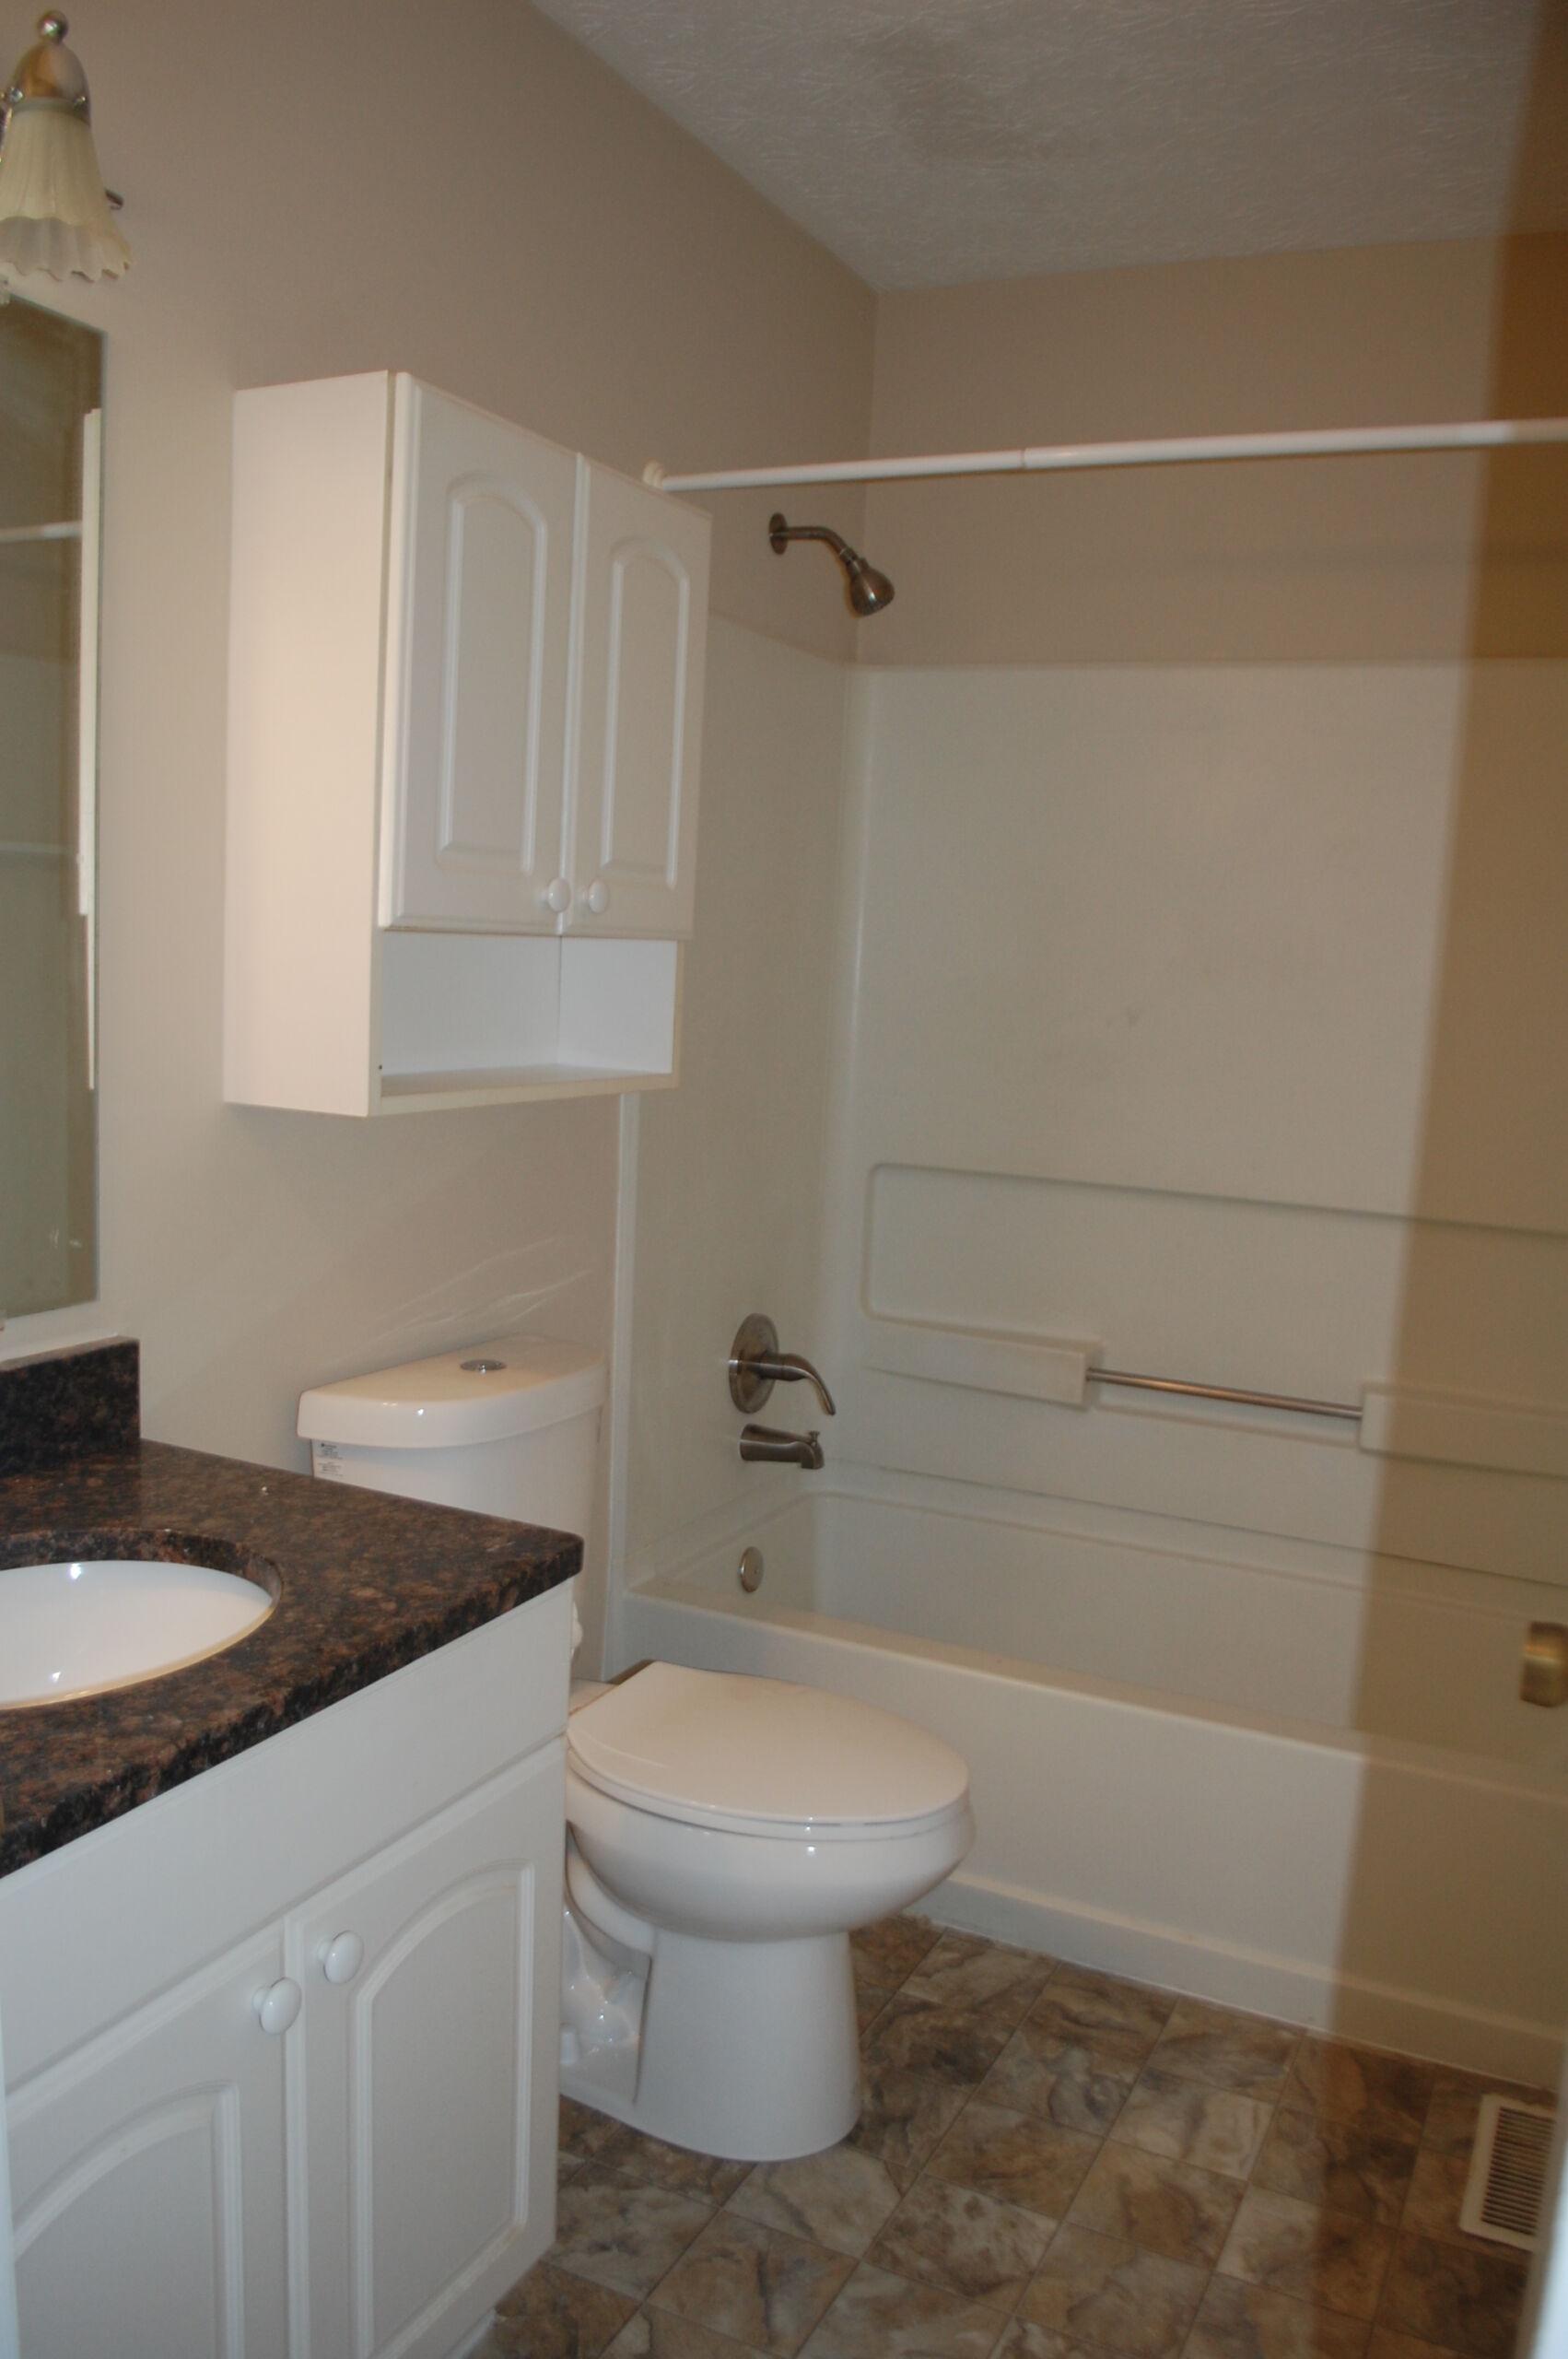 RARE Updated 3-Bedroom, 1.5-Bath Condo in Worthington Schools with Garage + Extra Parking!